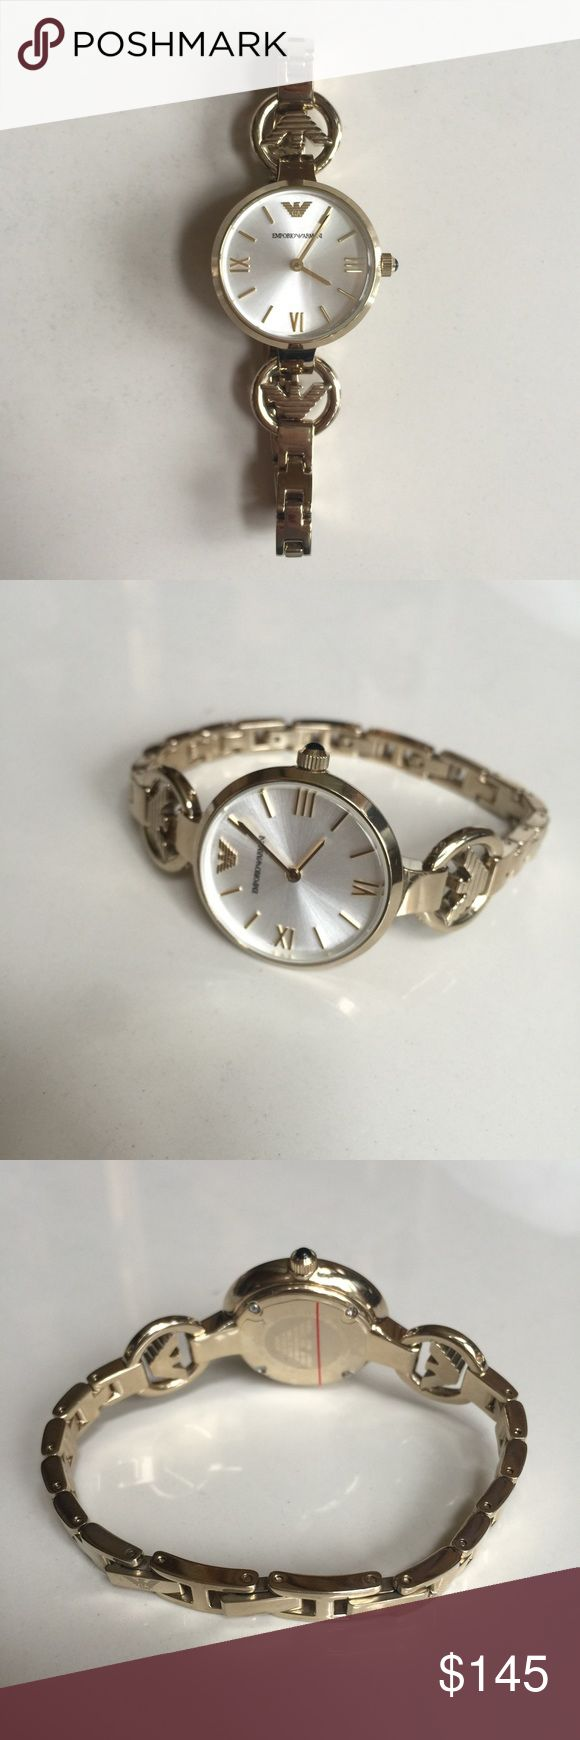 Emporio Armani Retro Ladies Watch AR1774 100% authentic Emporio Armani Retro Ladies Watch AR1774. Roman numeral hour markers. Quartz movement. In excellent condition. Emporio Armani Accessories Watches